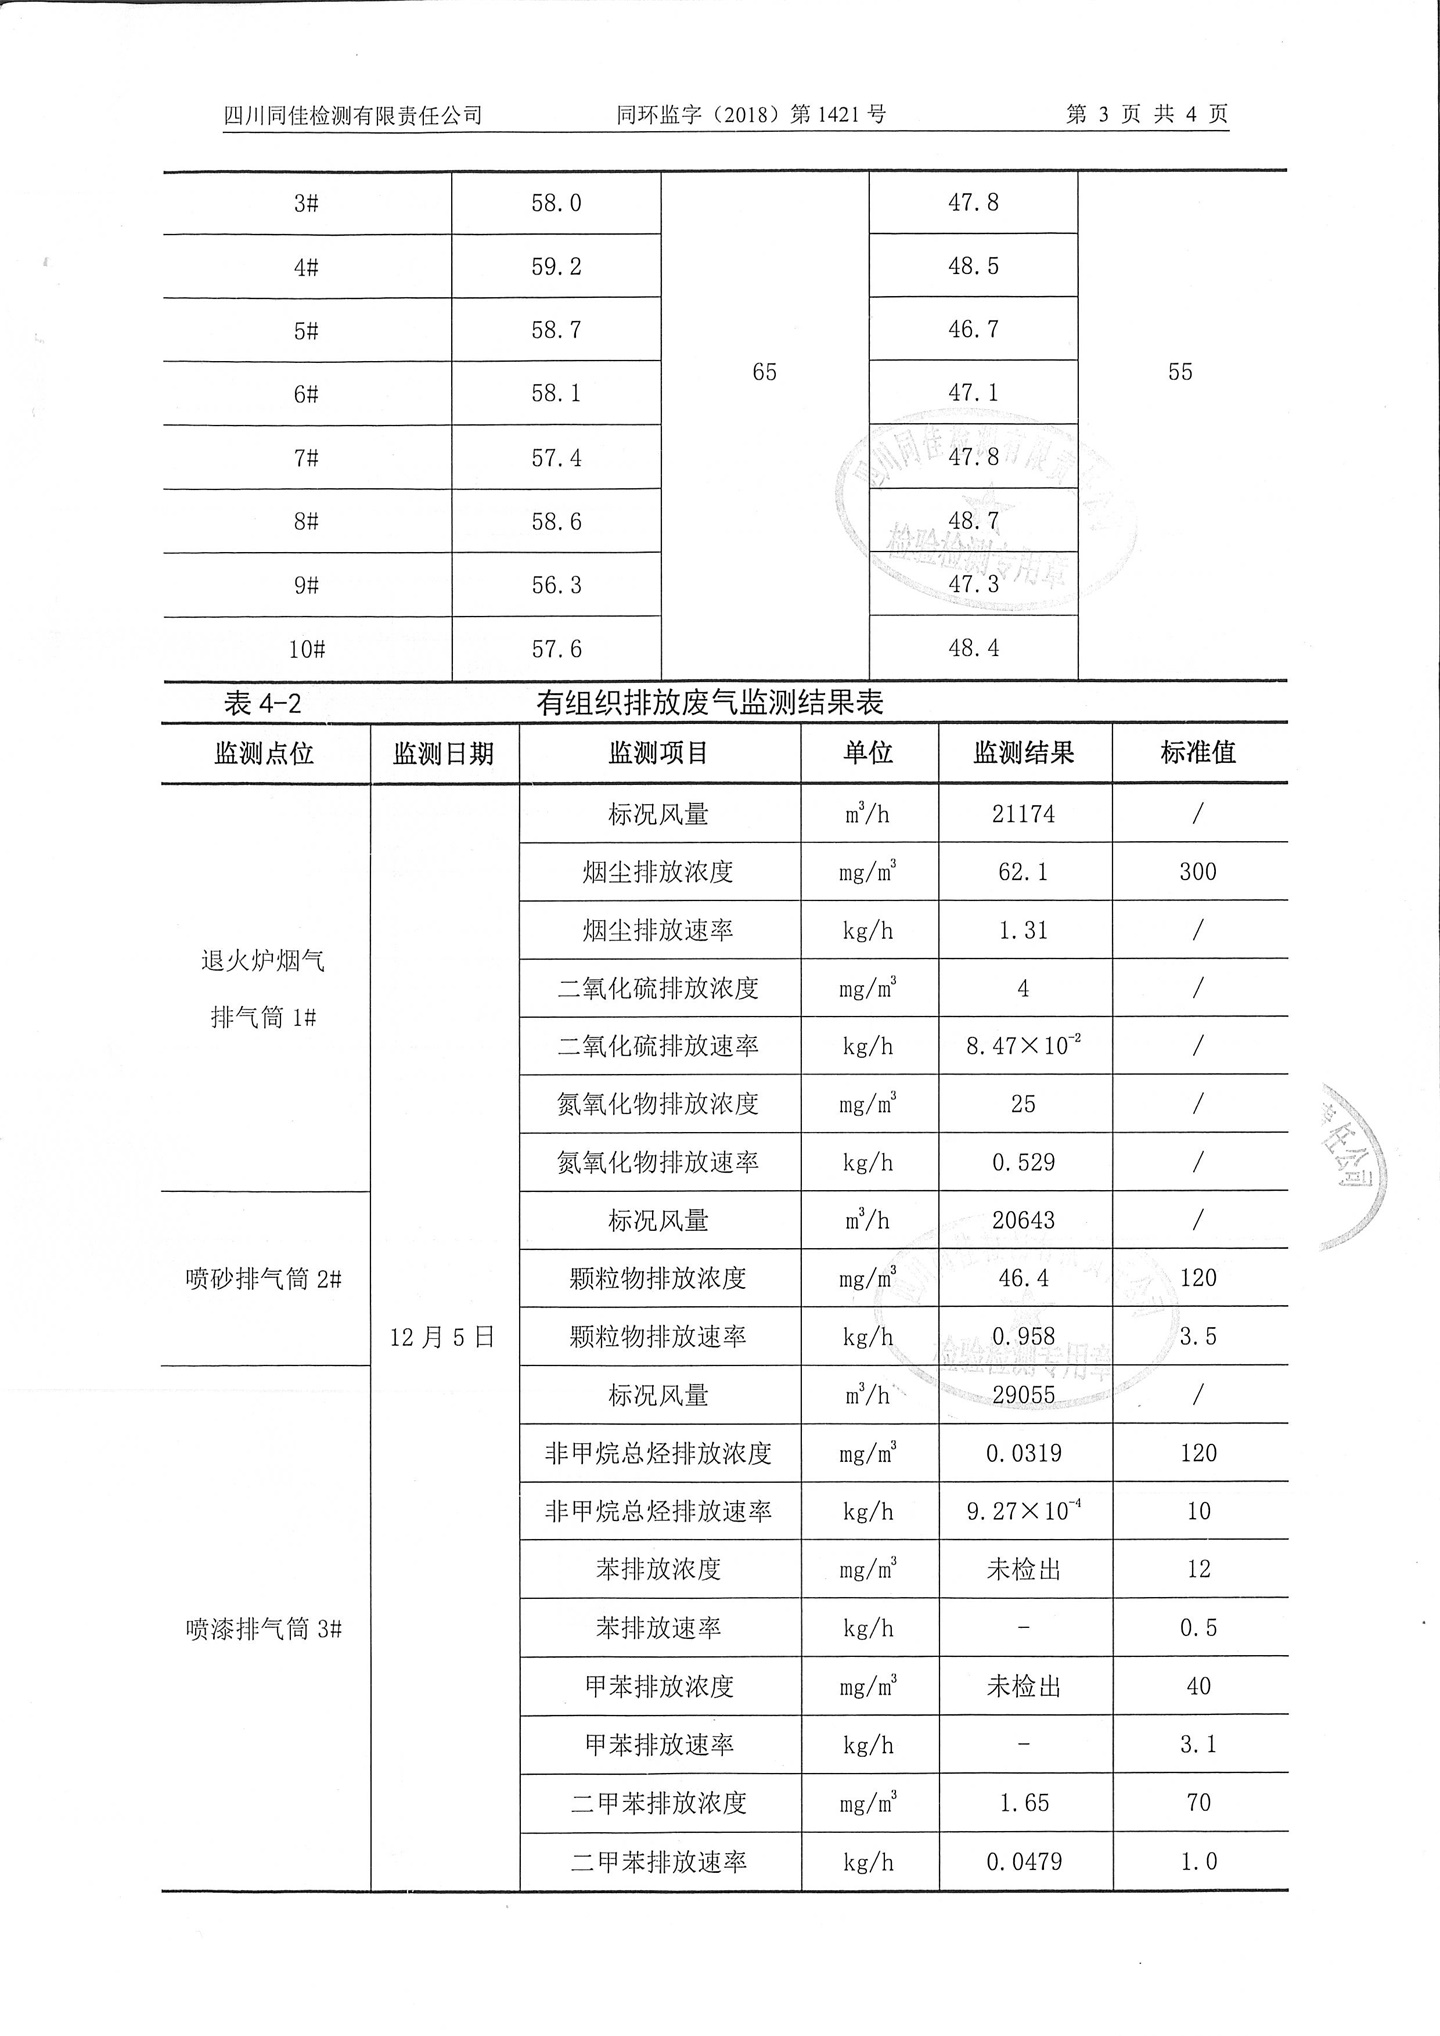 http://qiniu.cloudhong.com/image_2019-01-22_5c4617ef9c4c2.jpg